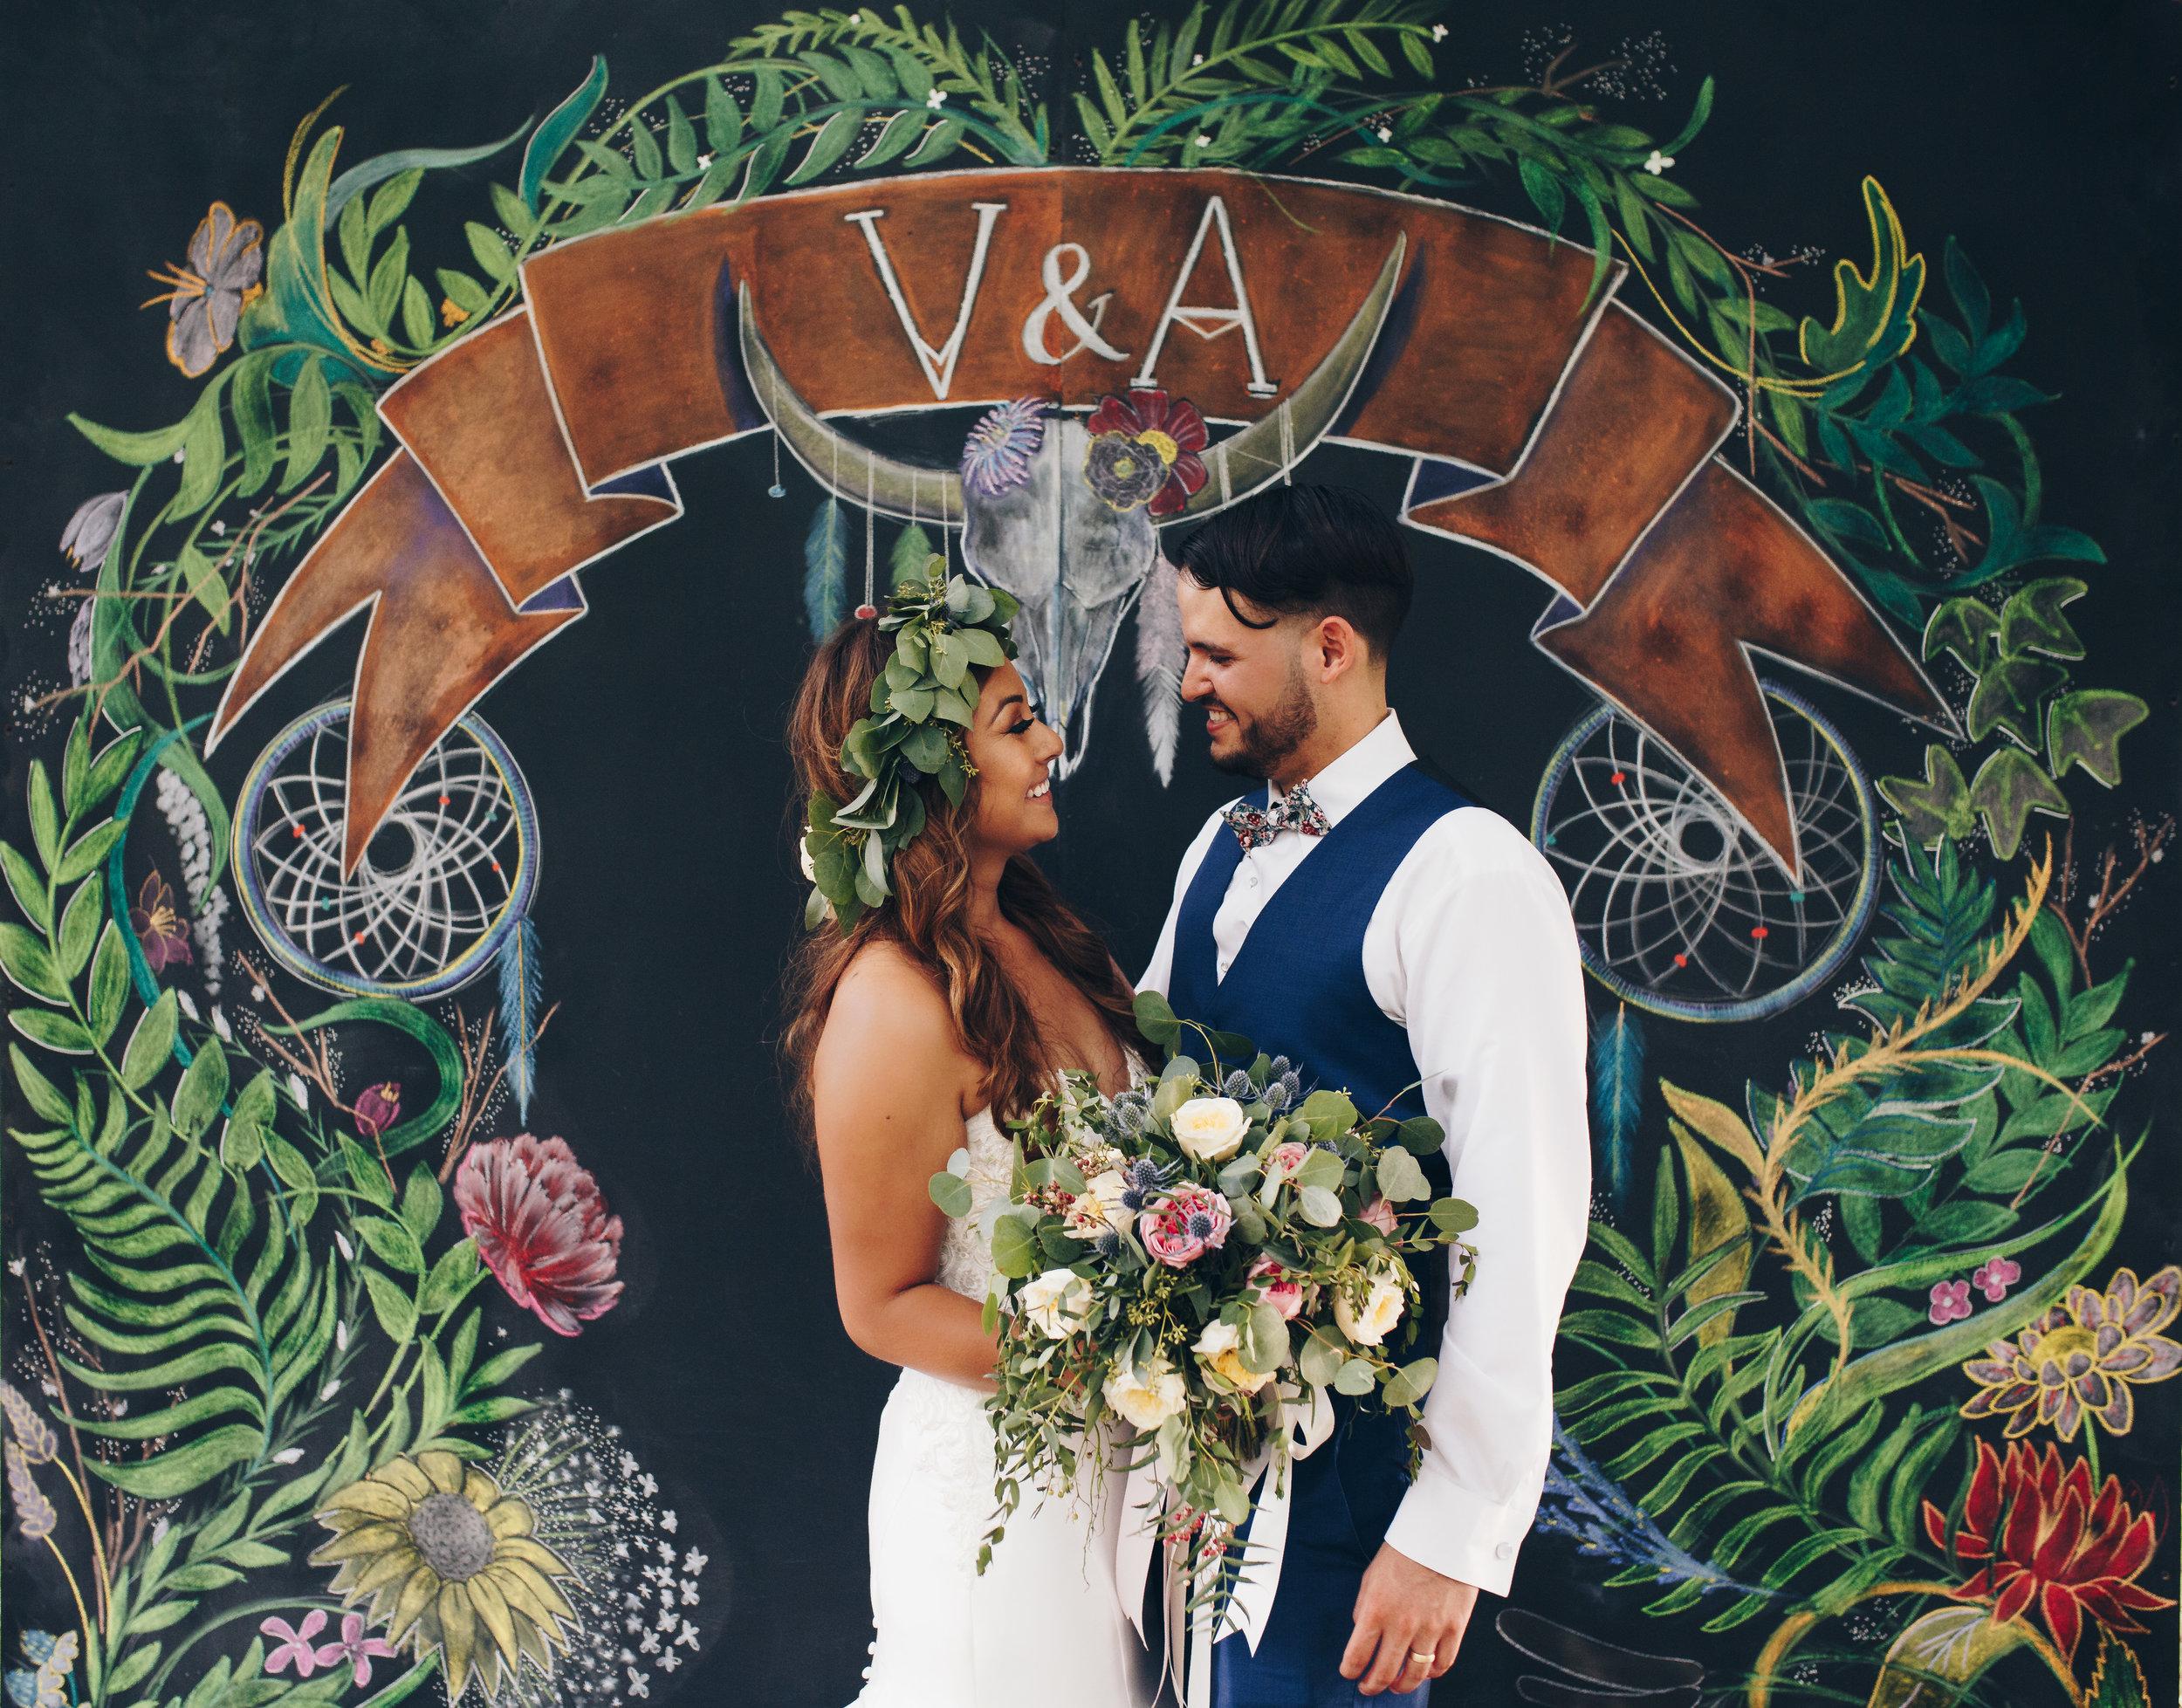 Veronica & Adrian Wedding 59 (1 of 1).jpg